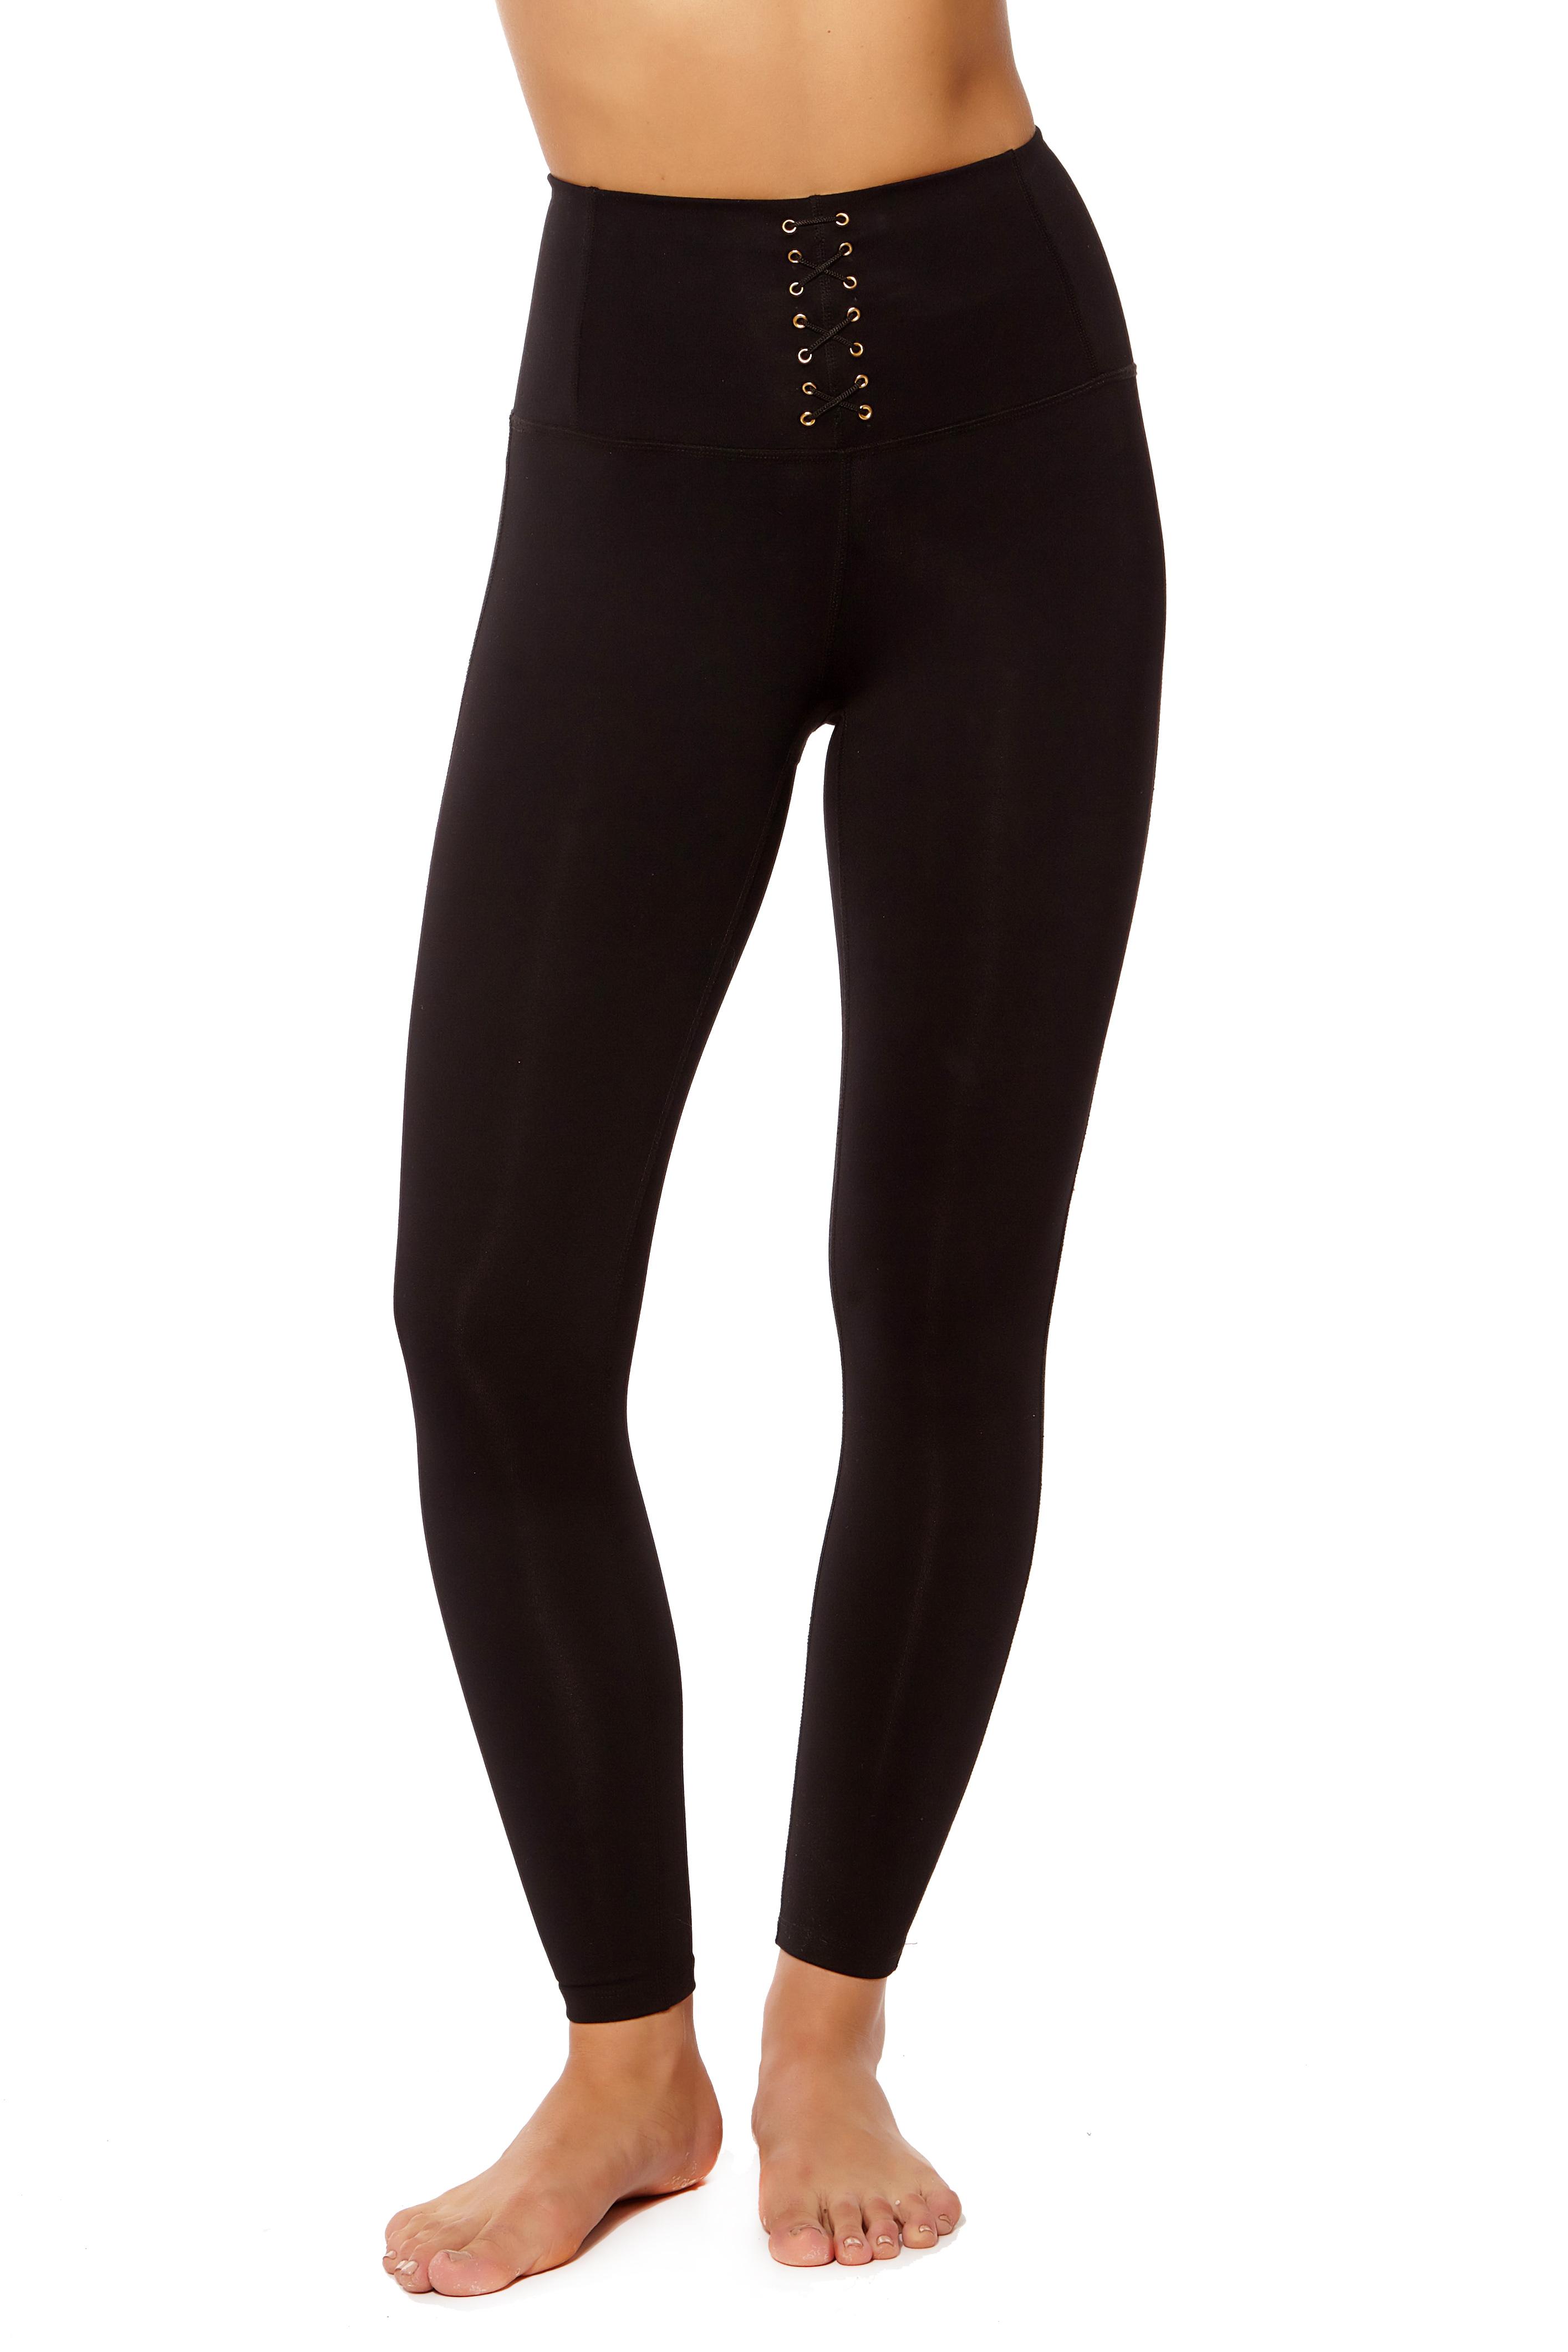 Form Fitting High-Waisted Leggings (1)